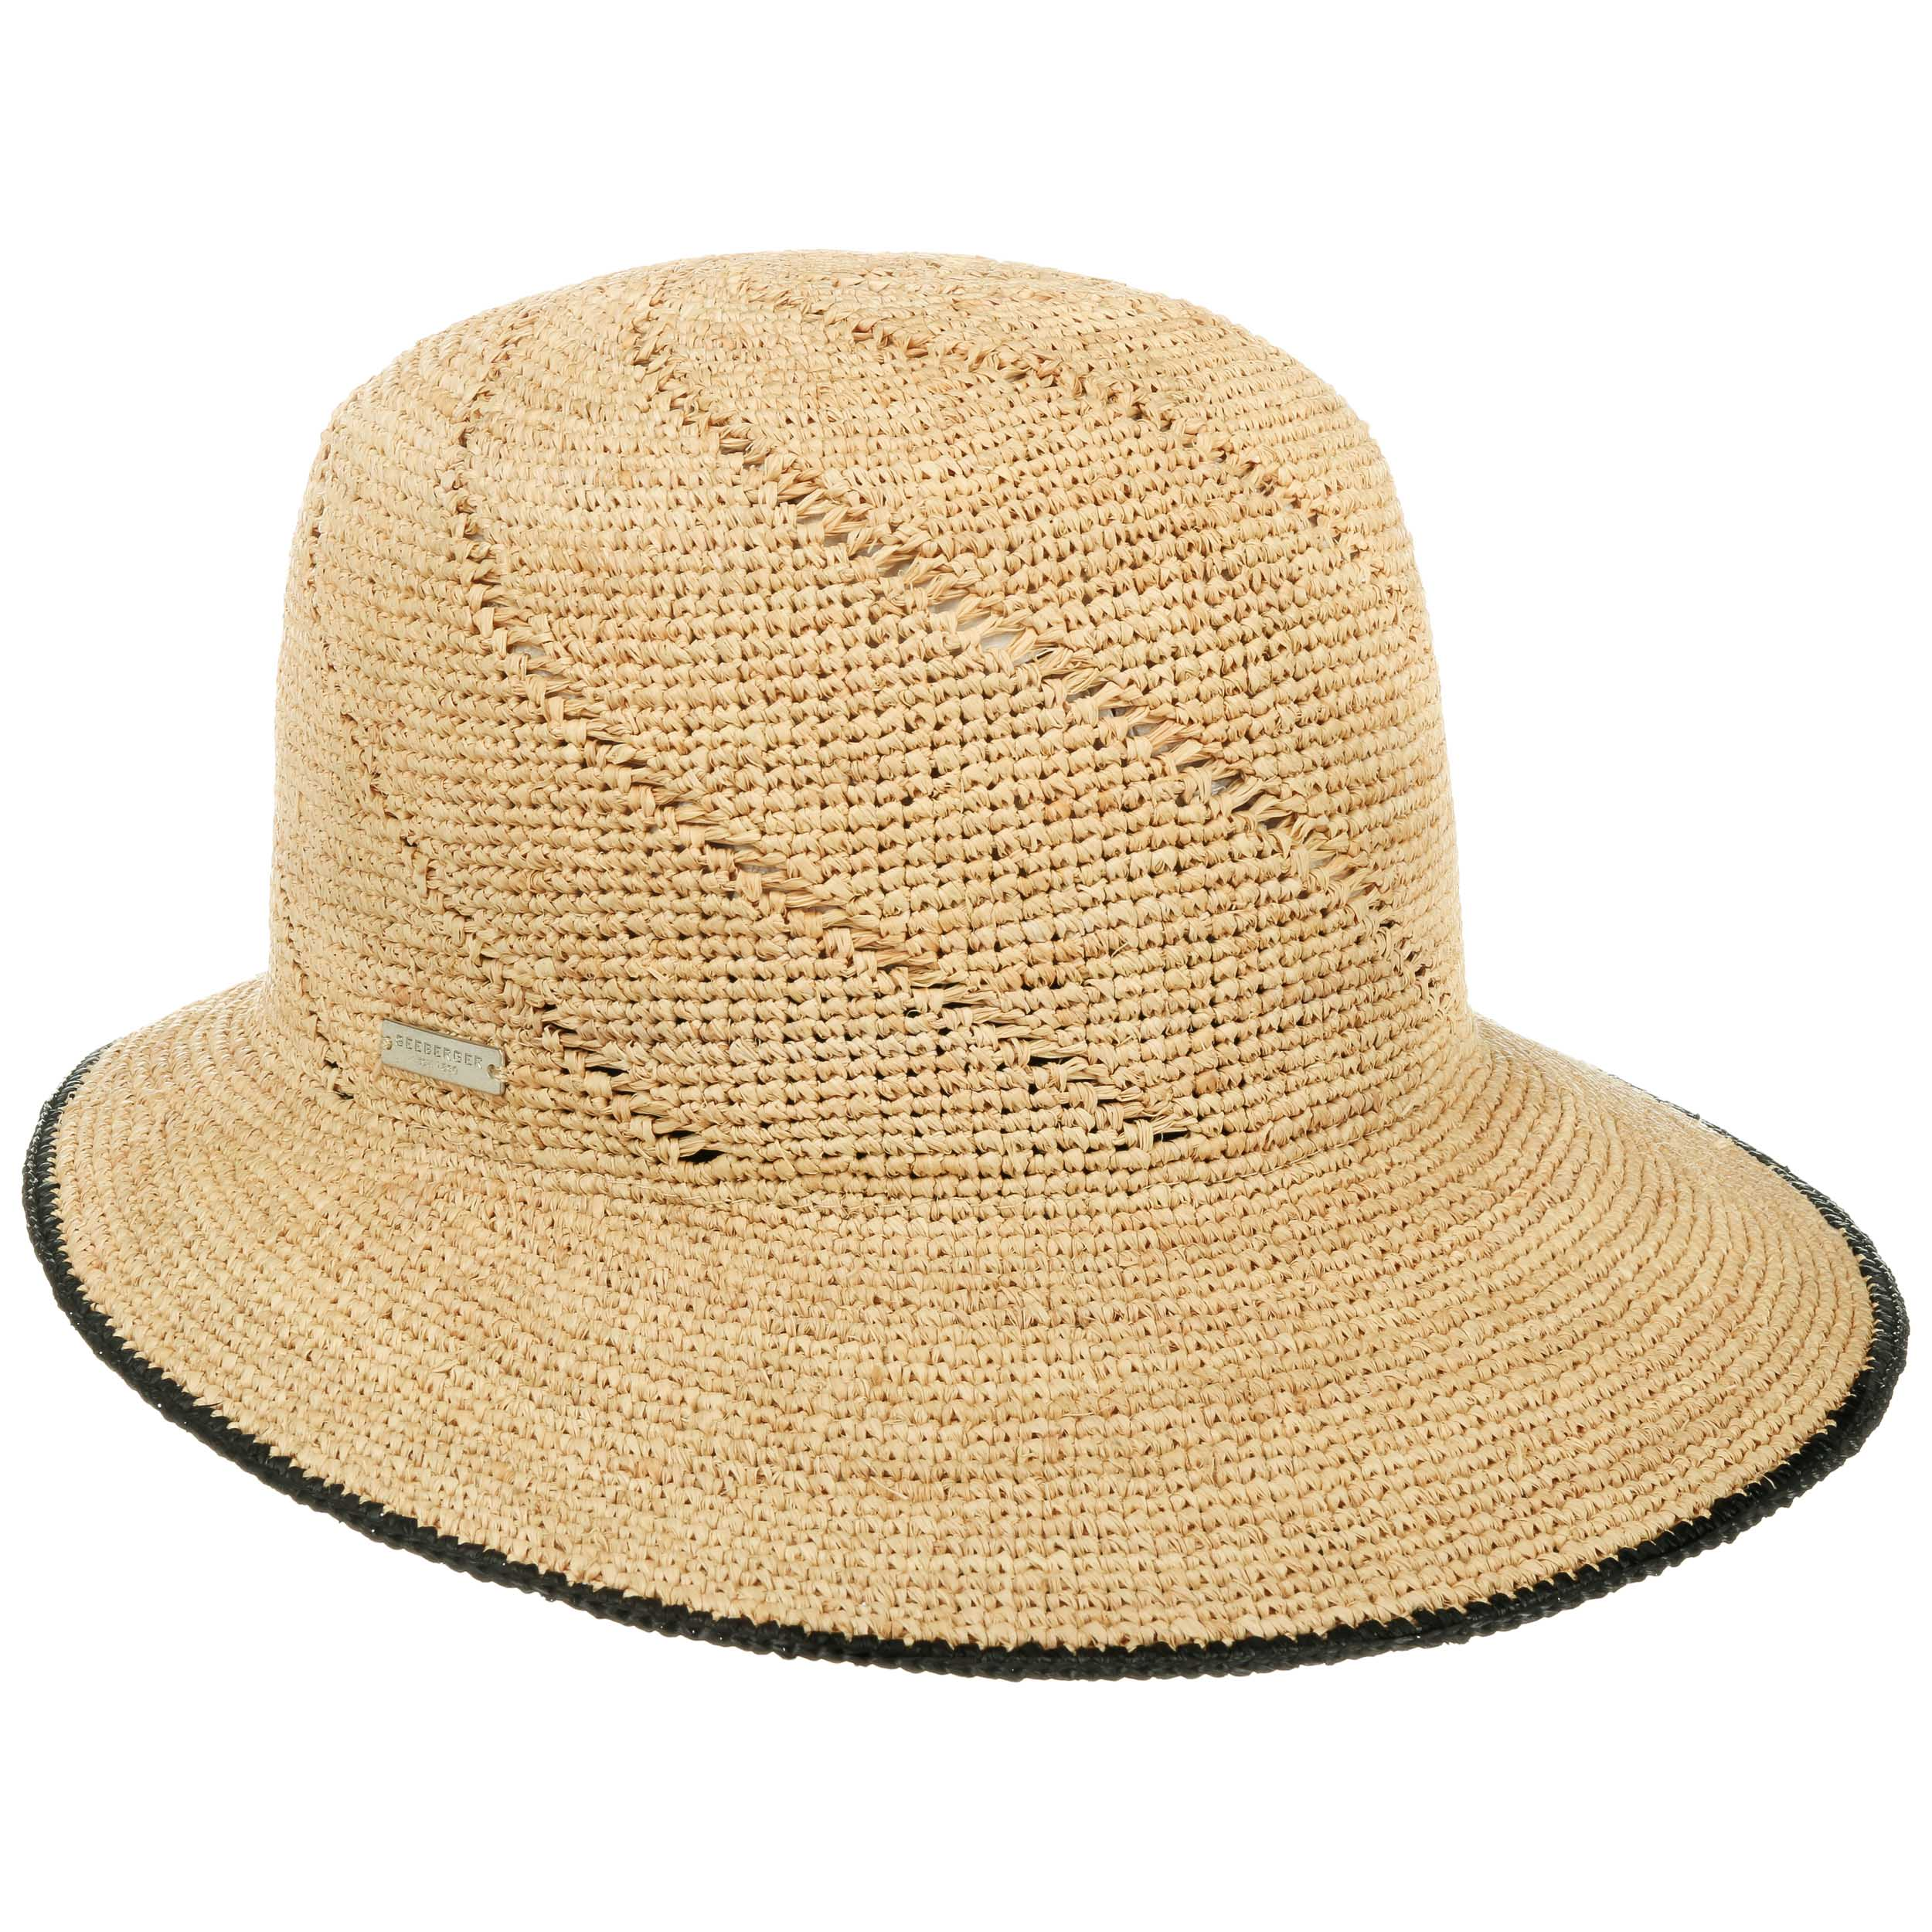 Seeberger Raffia Straw Cap Linen/Black